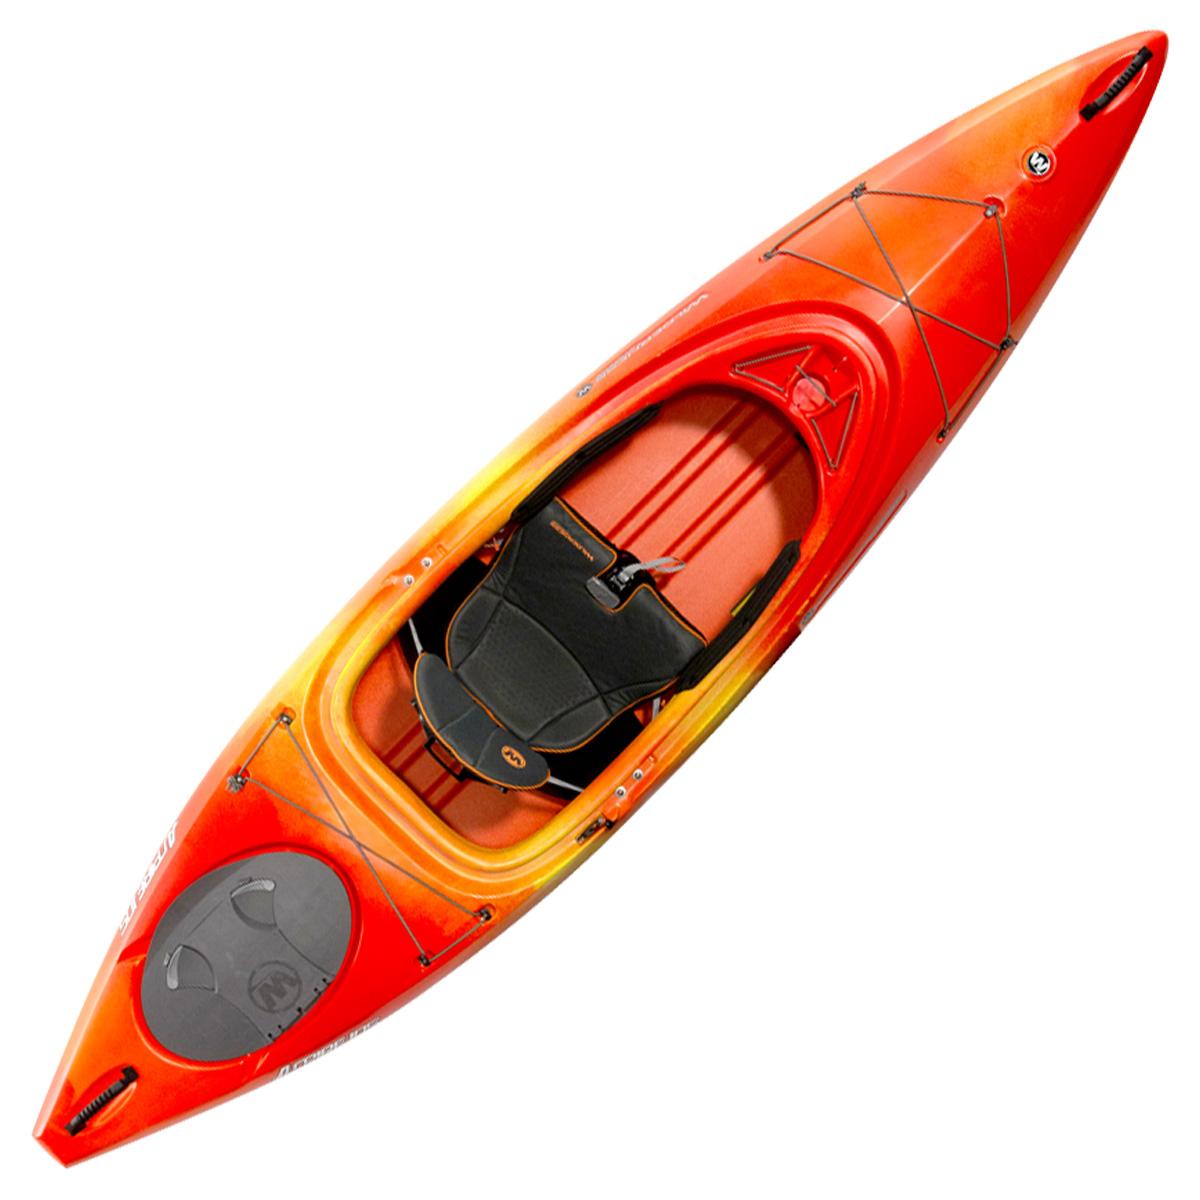 Wilderness Systems Aspire 105 Recreational Kayak Mango